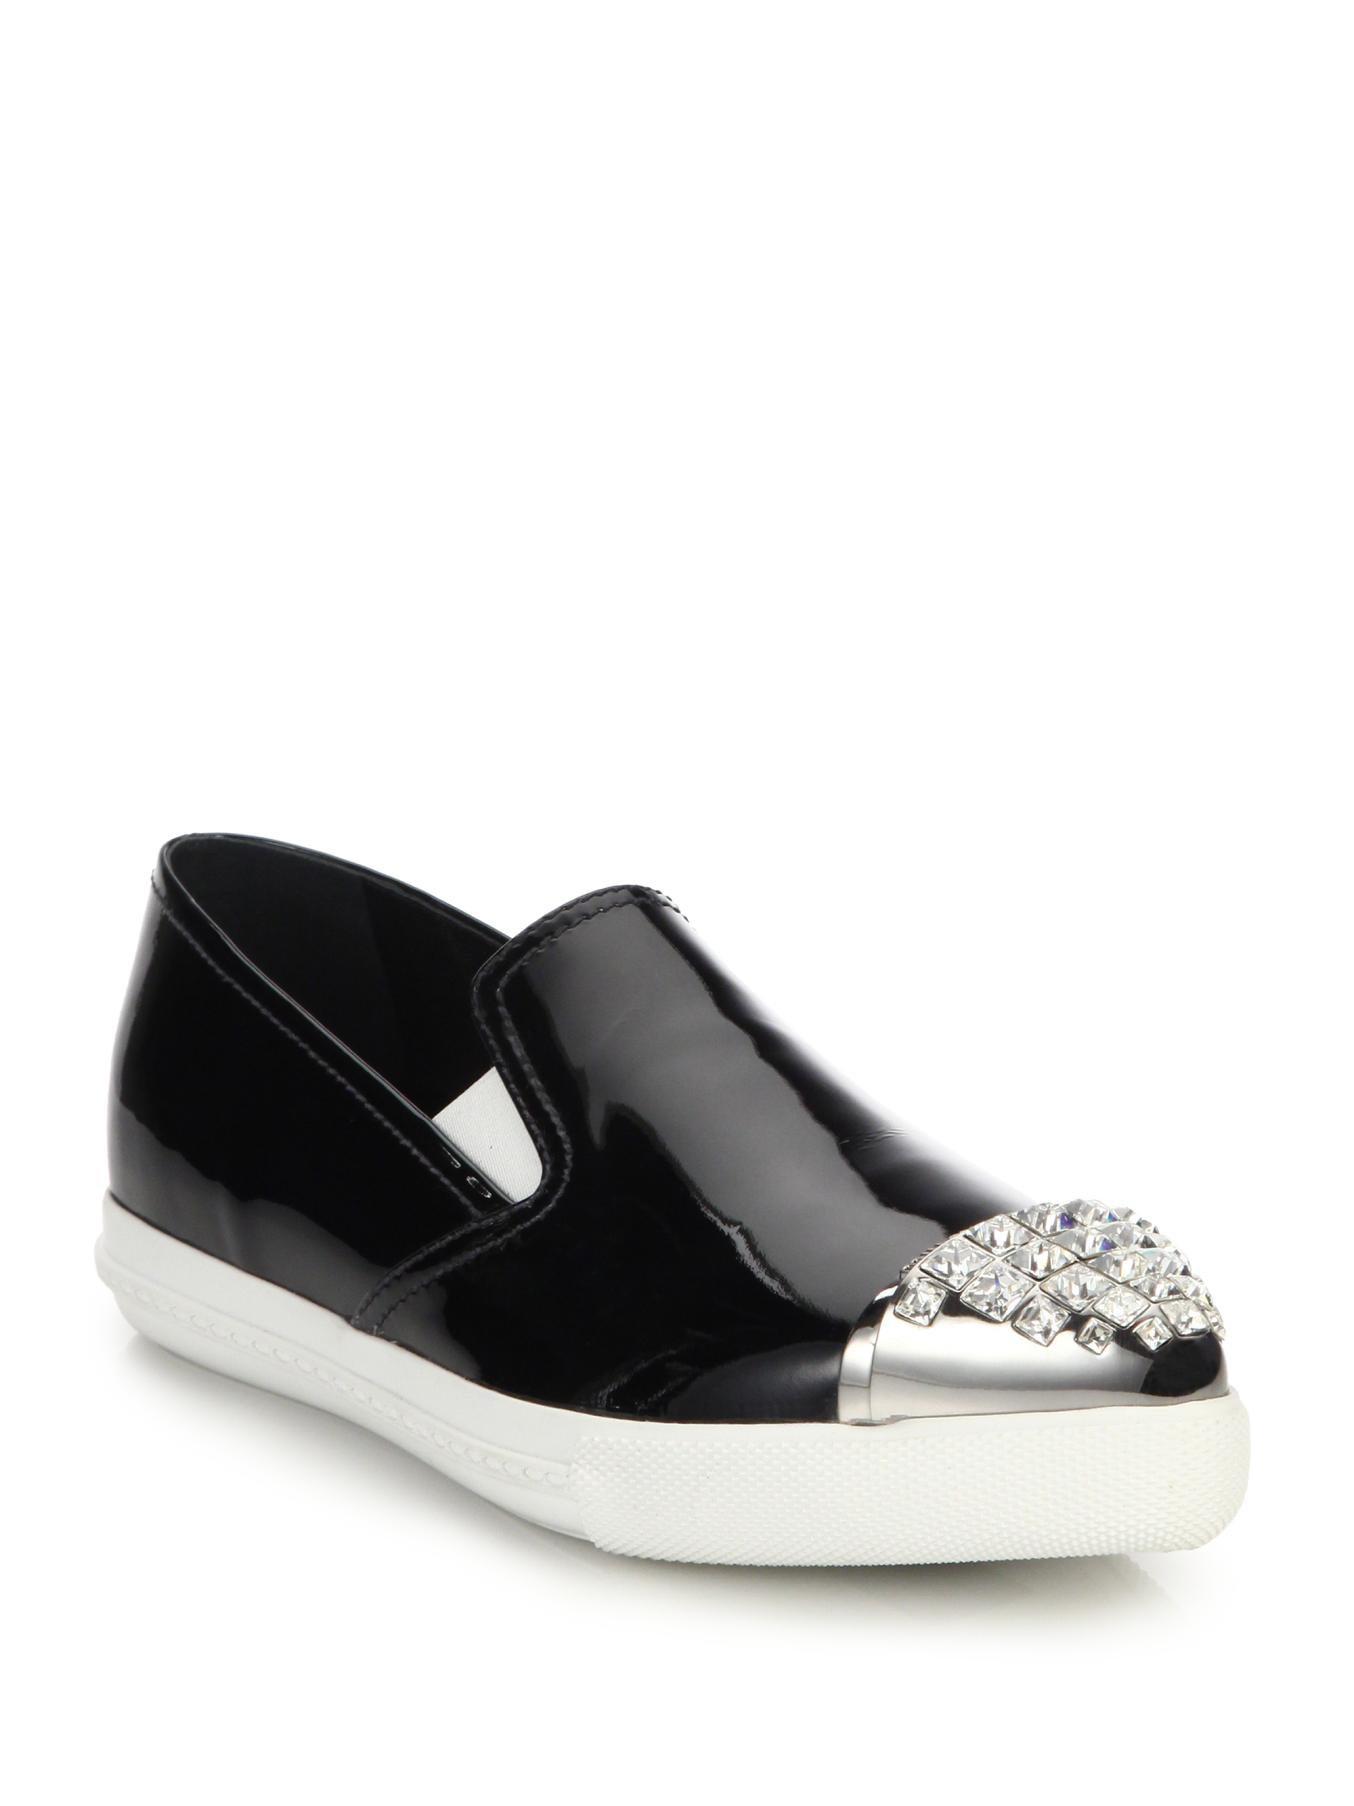 miu miu embellished patent leather sneakers in black lyst. Black Bedroom Furniture Sets. Home Design Ideas